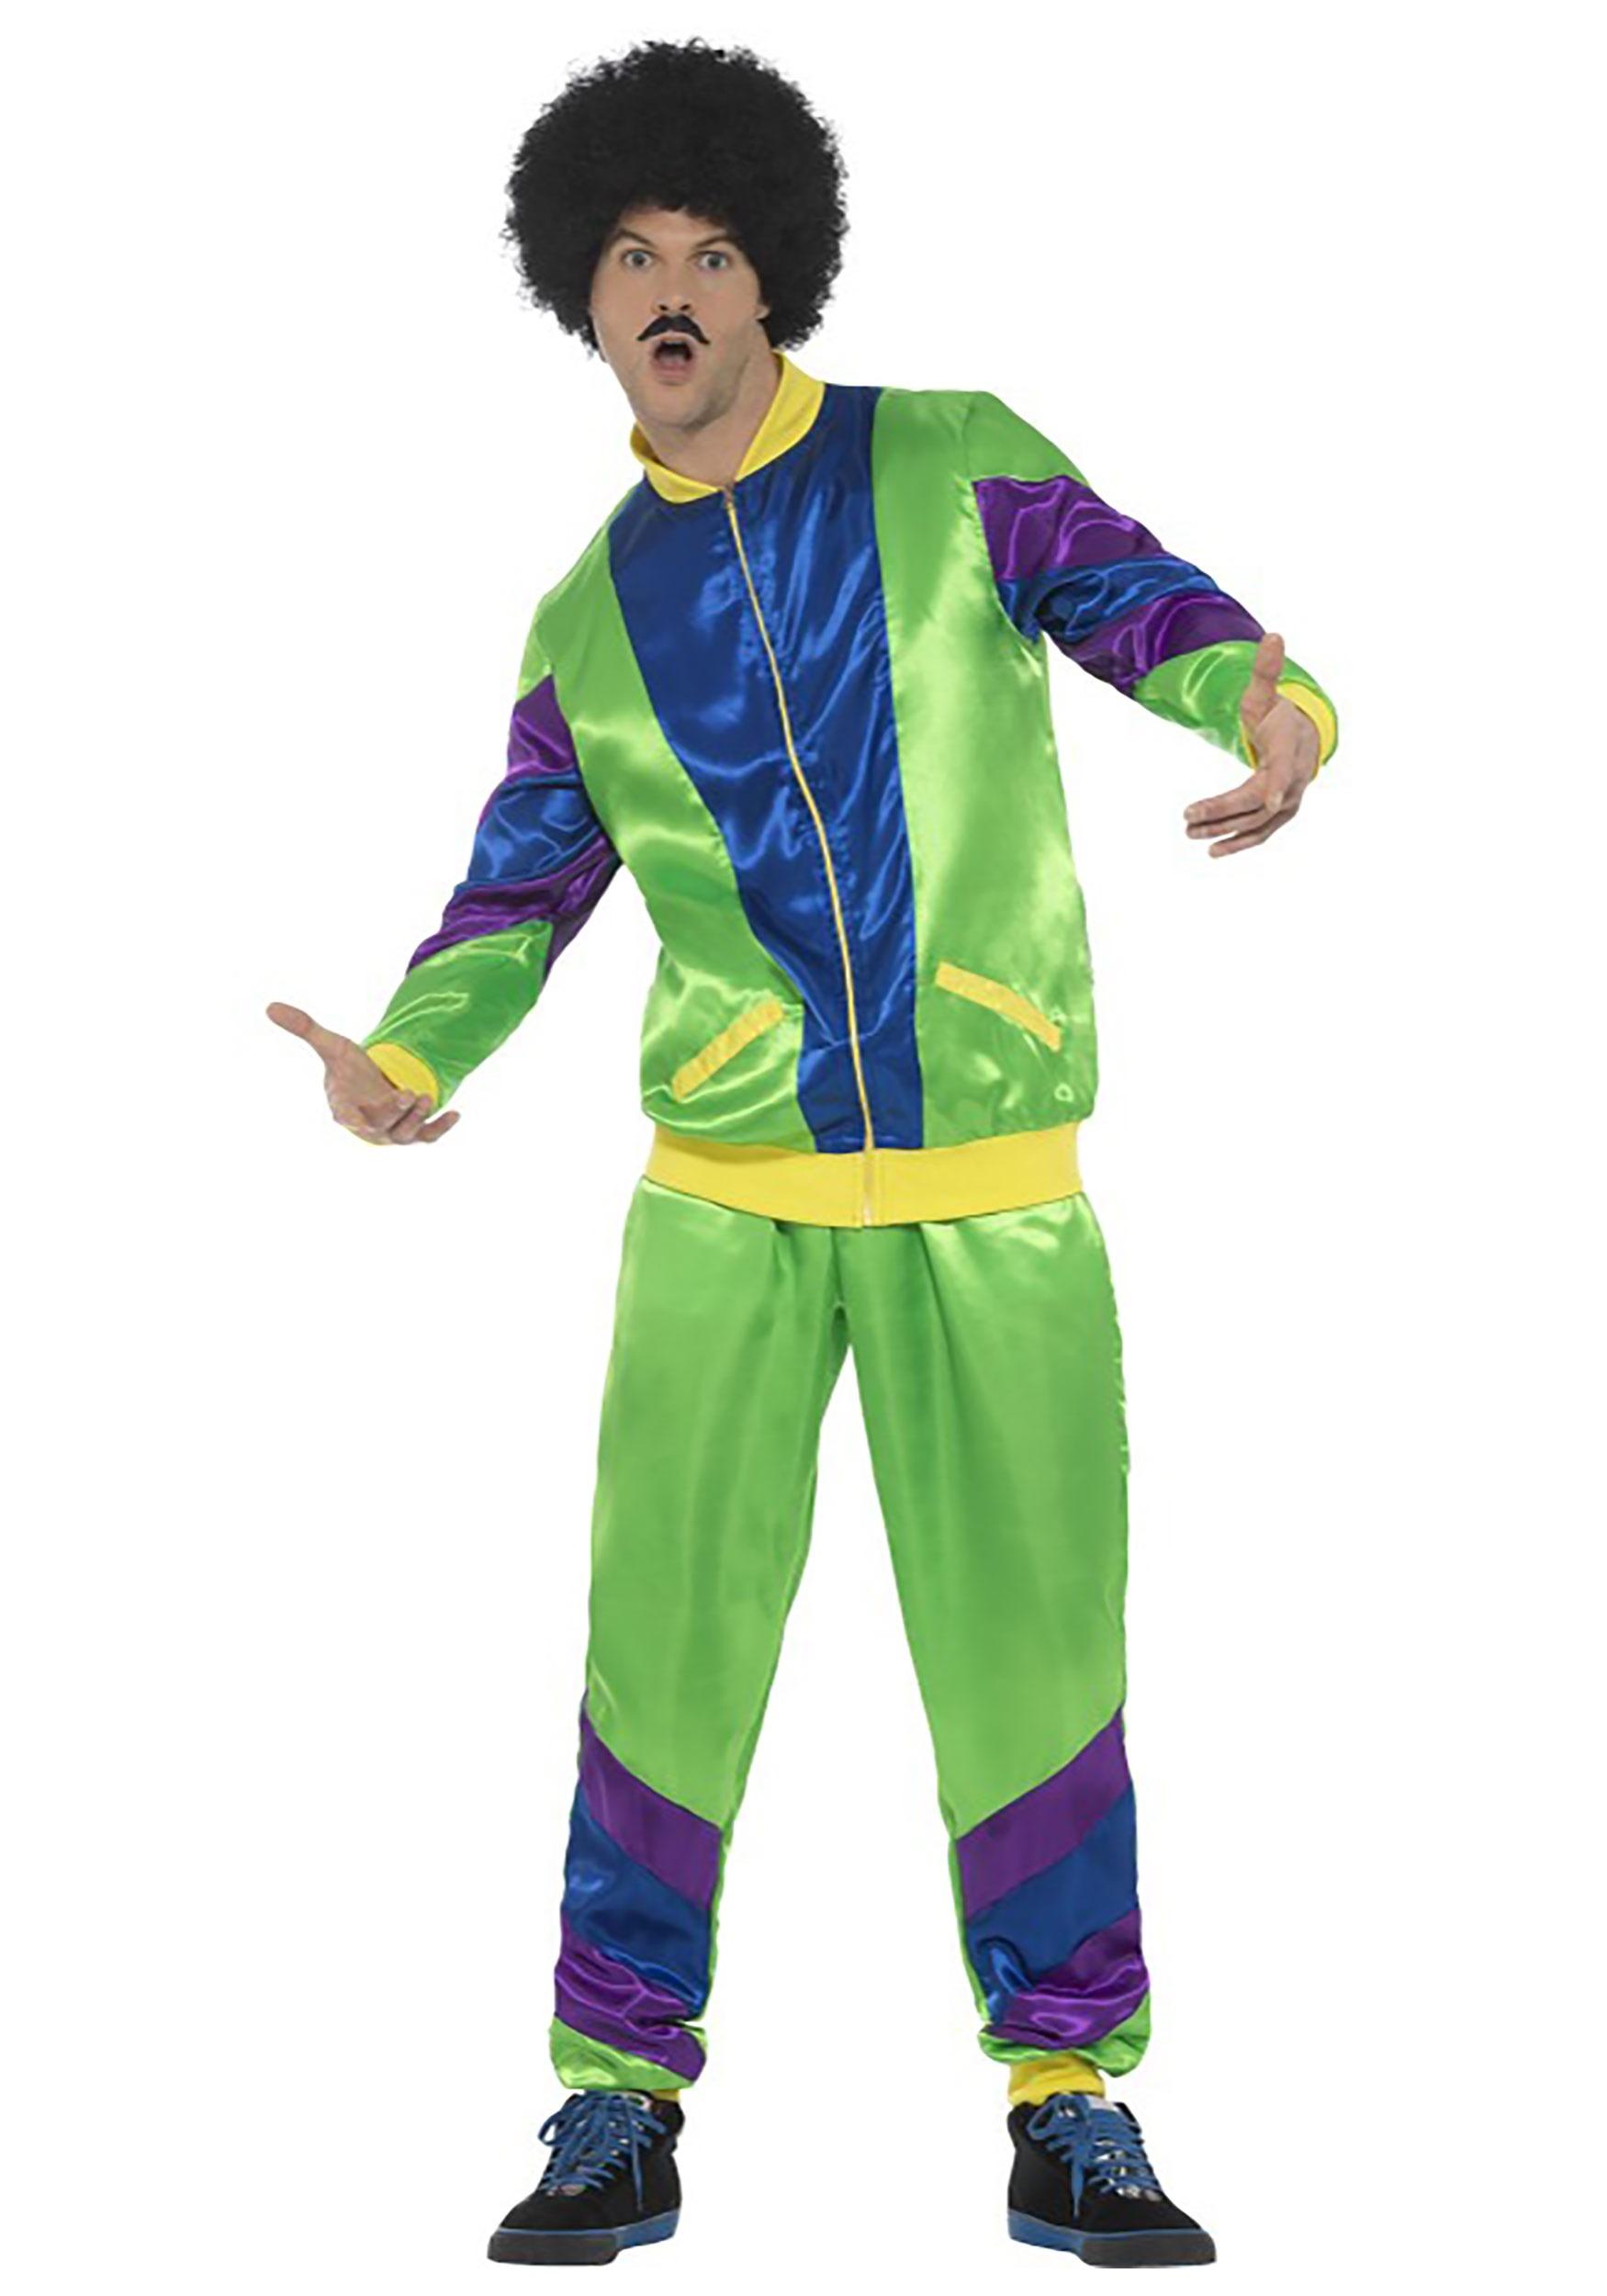 80s Tracksuit Men's Costume